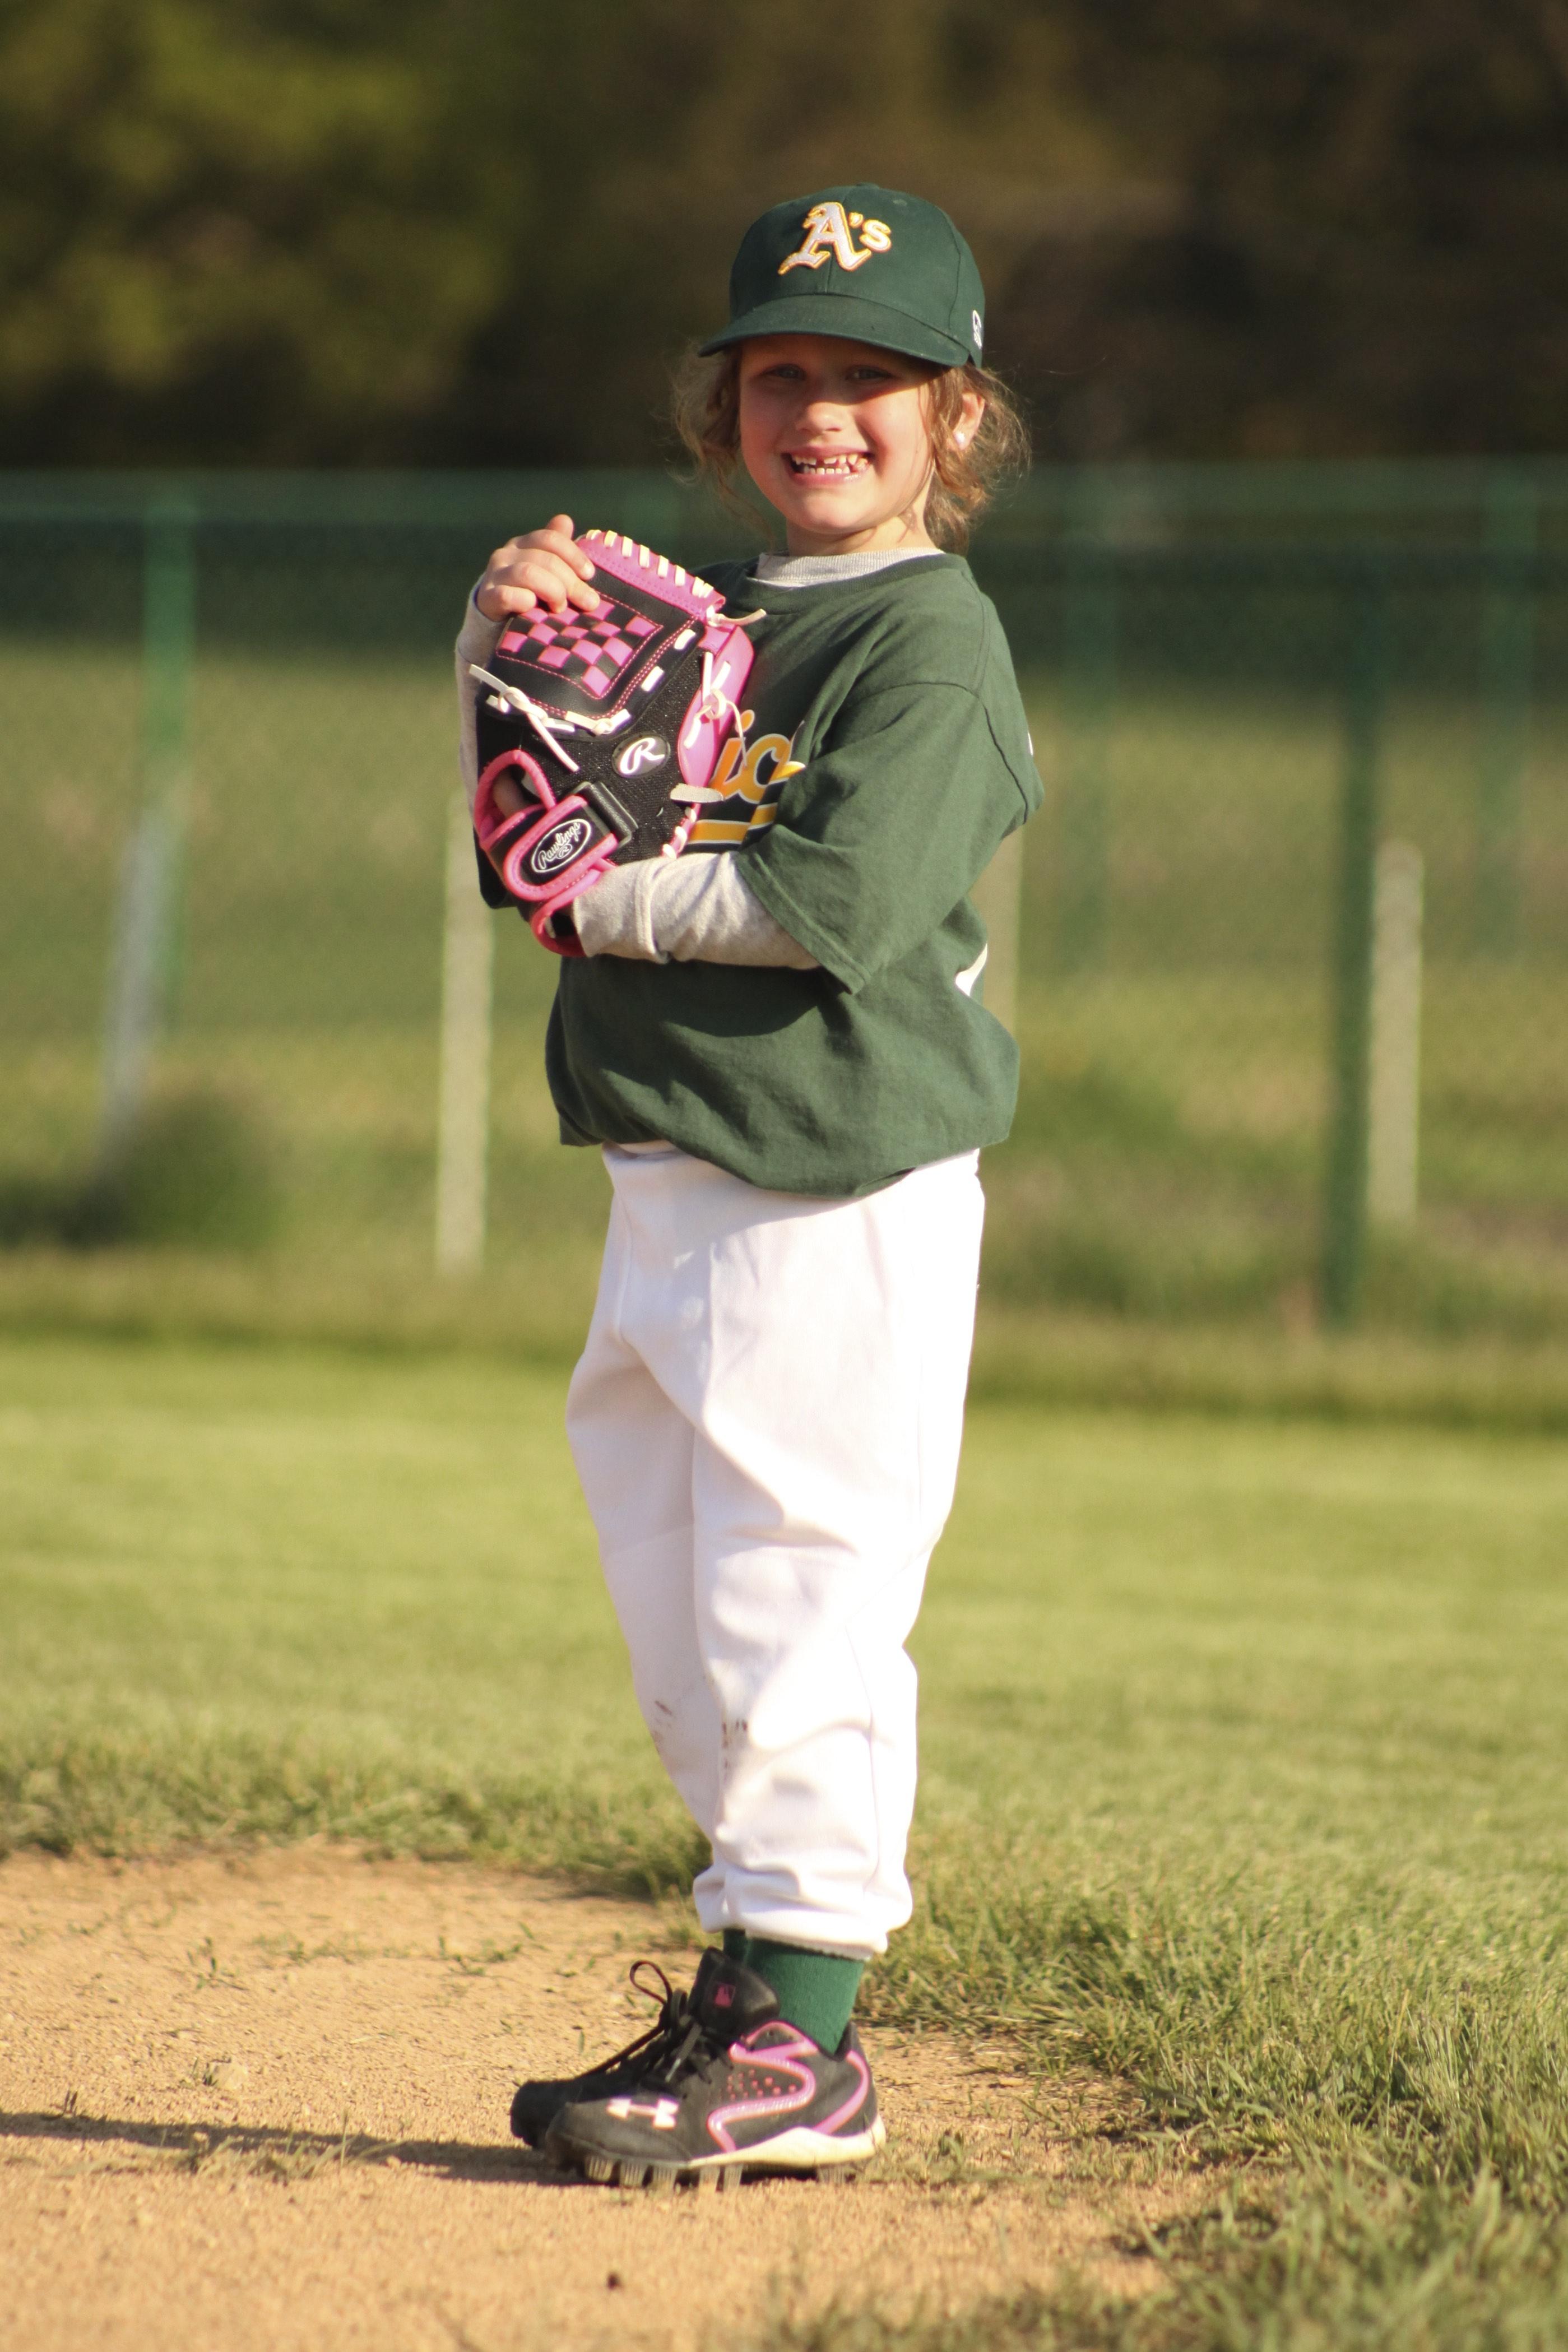 Mundelein Baseball And Softball Association